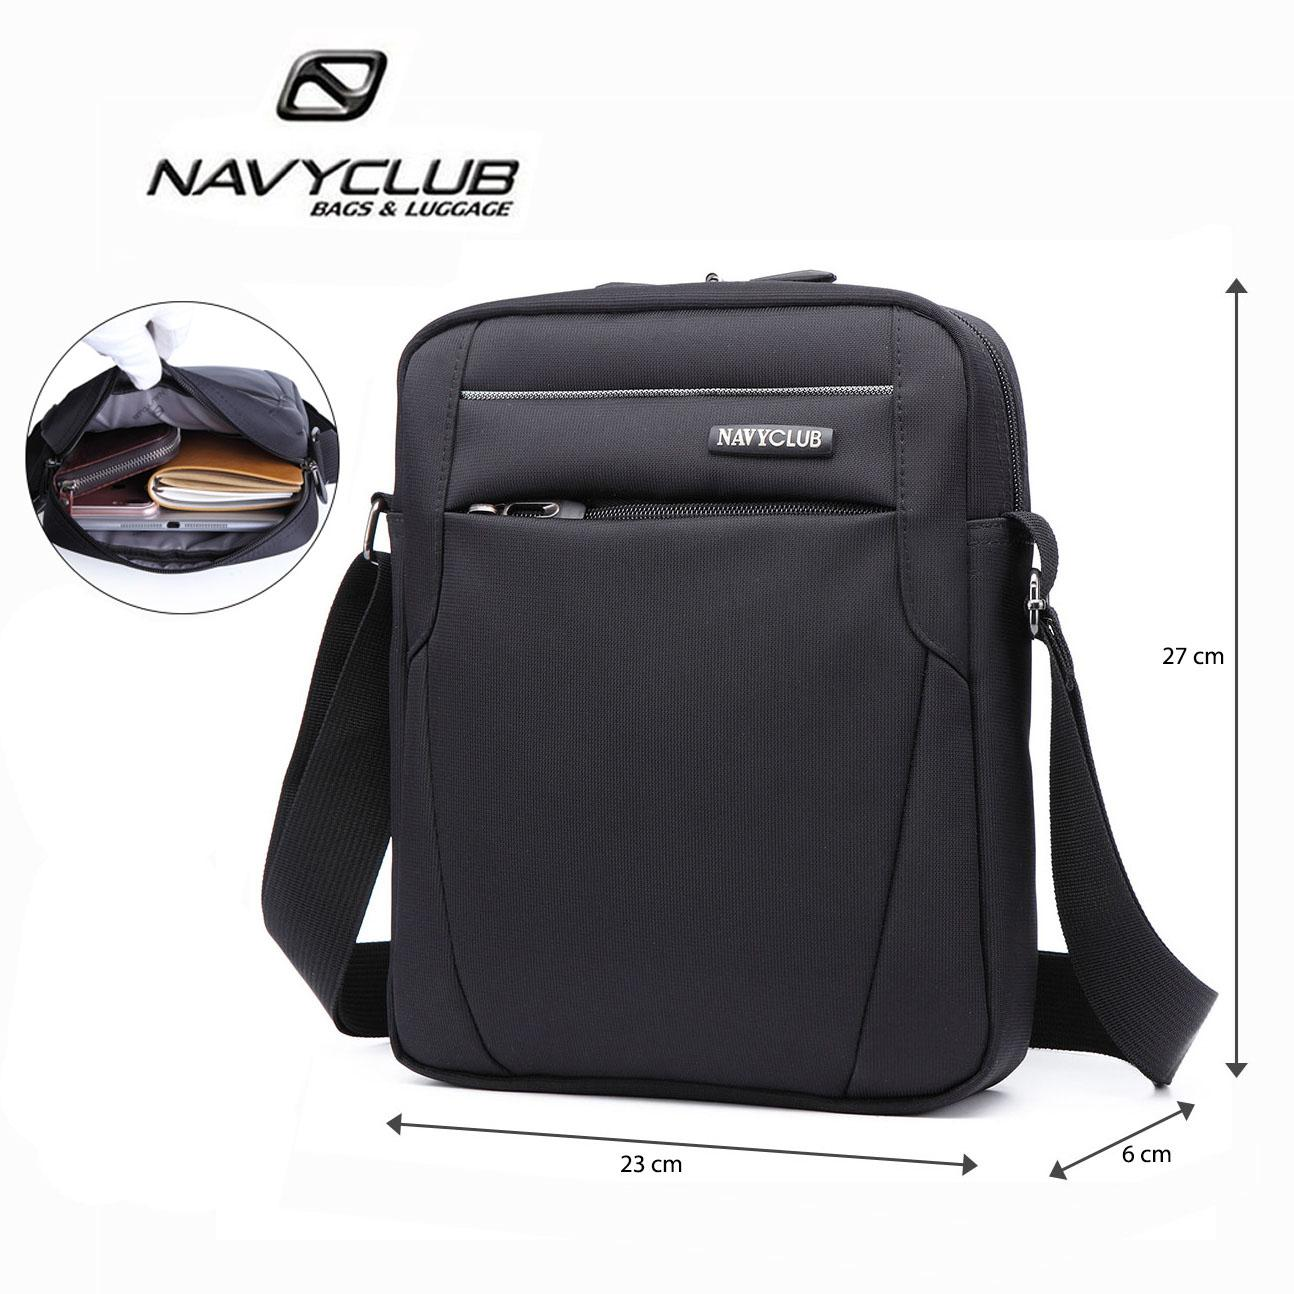 Tas Pelindung Laptop Berkualitas Lenovo Original Navy Club Selempang Travel Tablet Ipad Tahan Air Eeej Pria Wanita